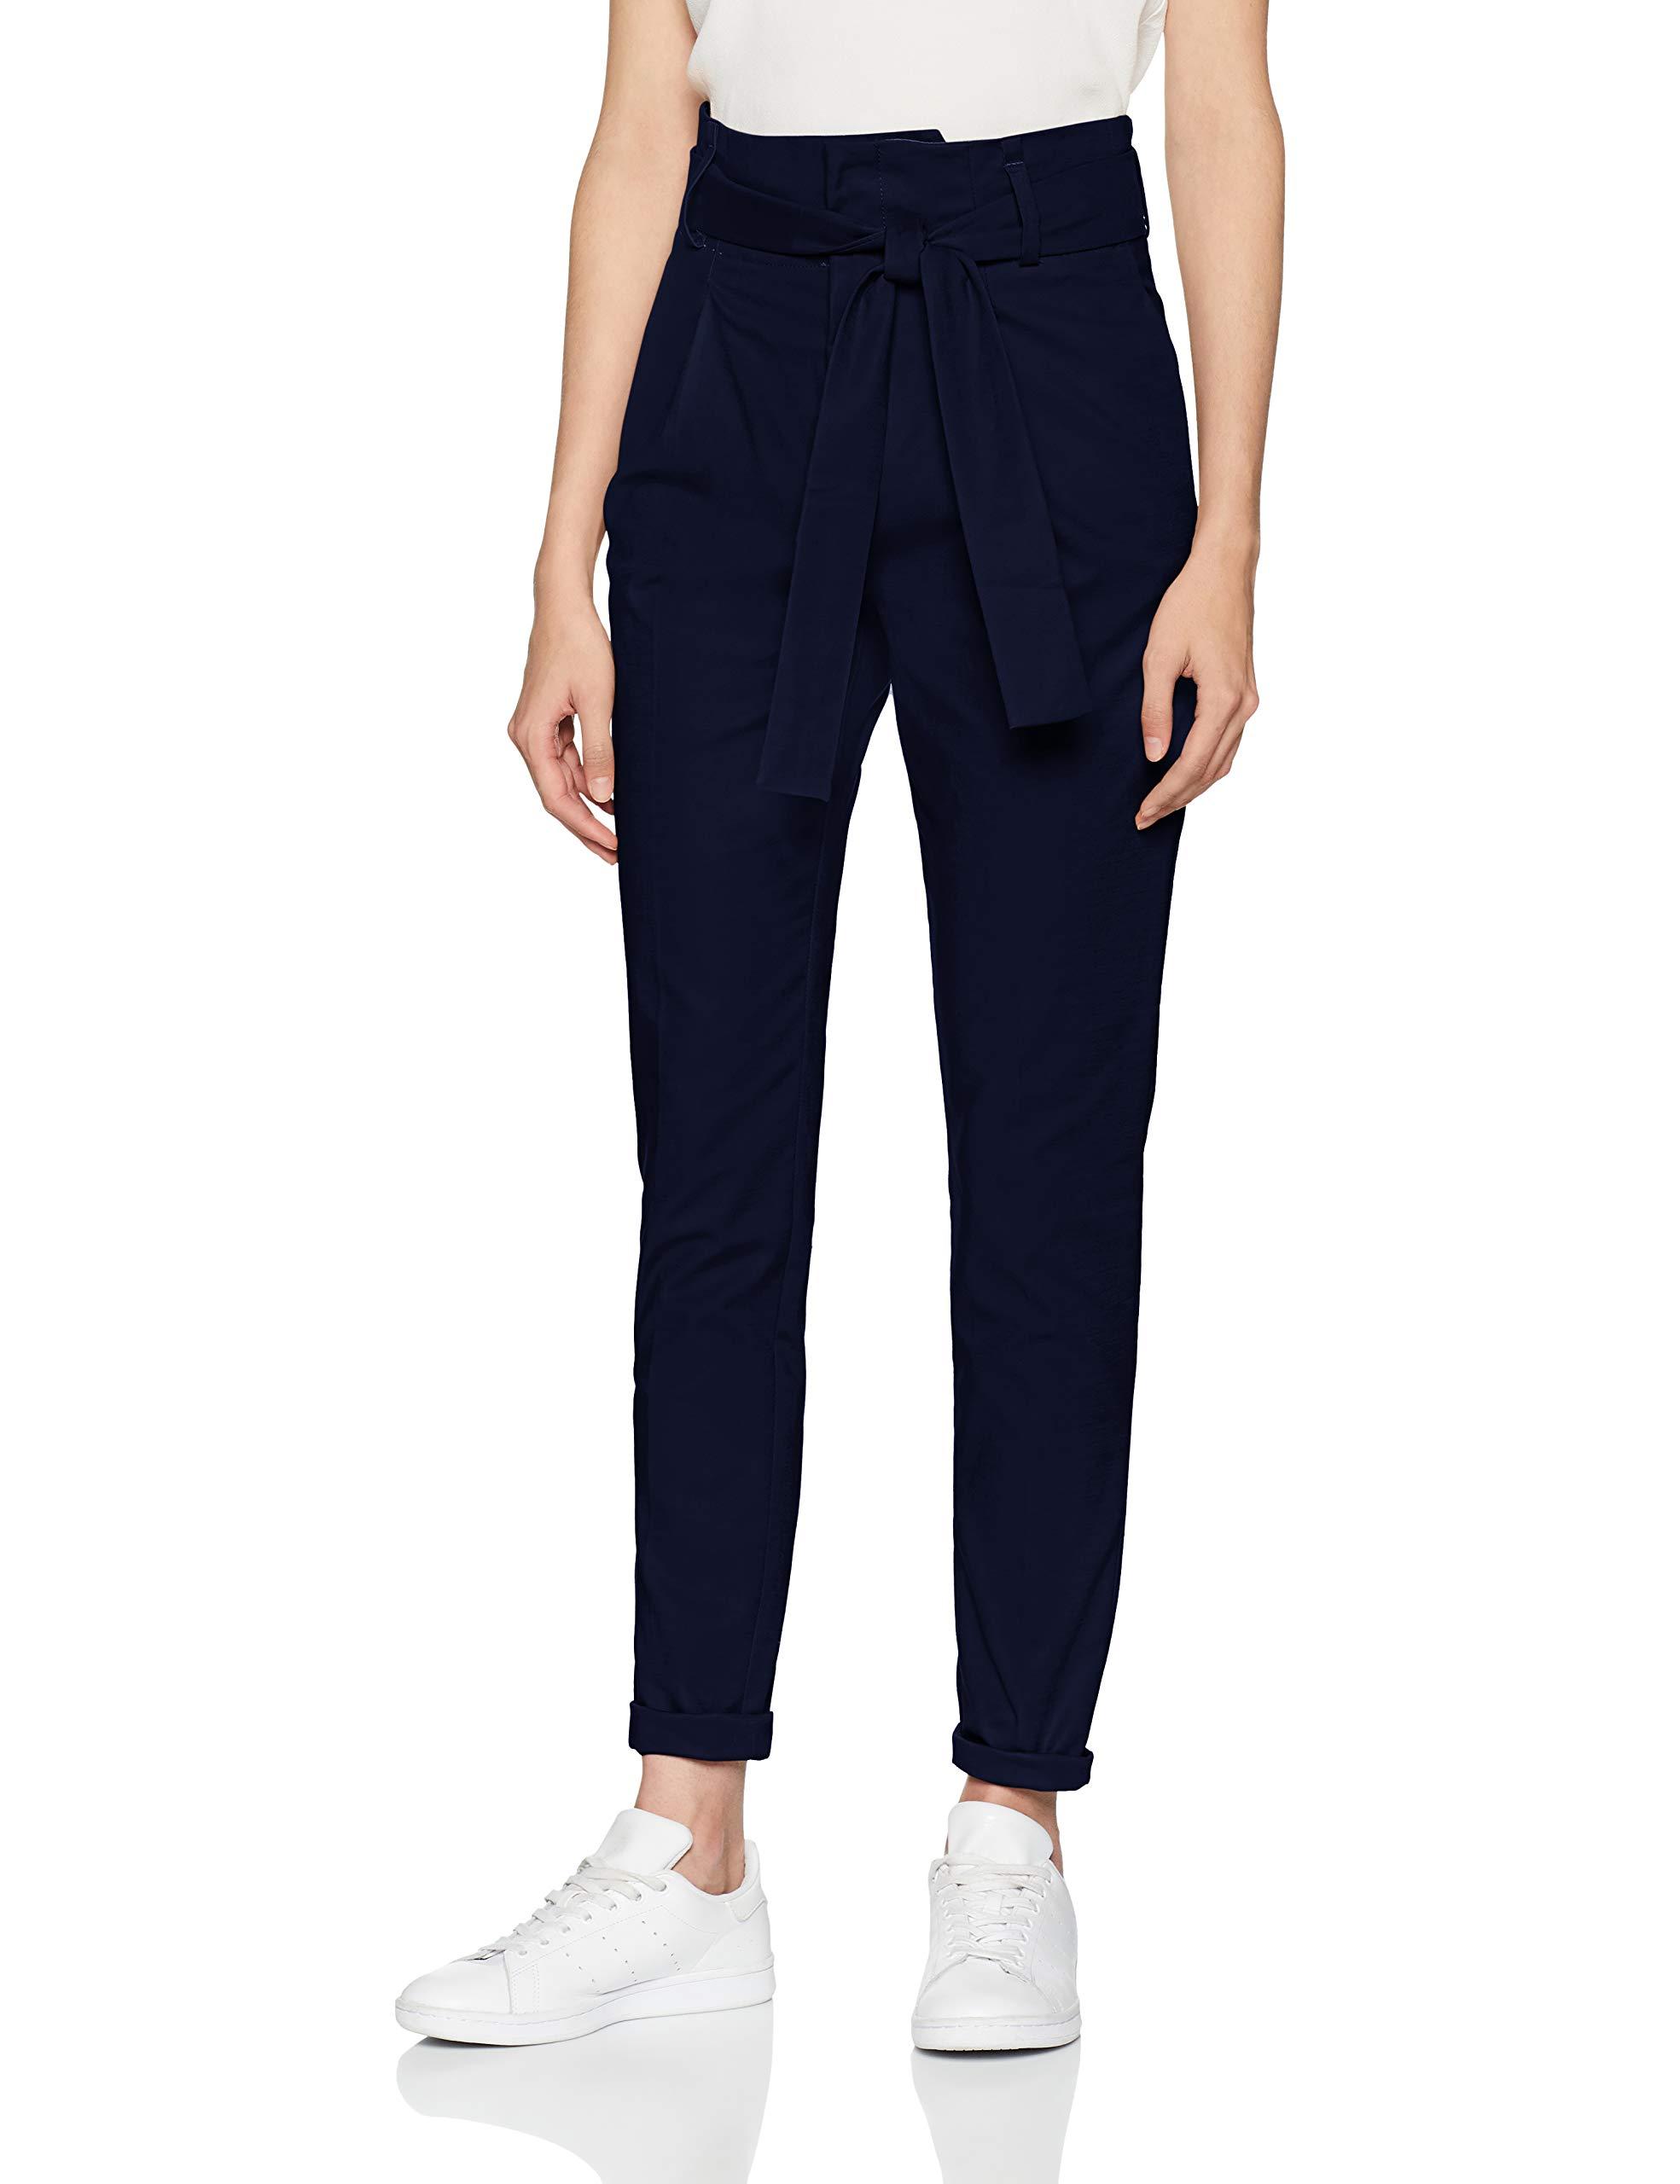 Blue Basic Straight 83338 Trousers Leg Noa Stretchs bleumaritime Femme f6Ybyvg7